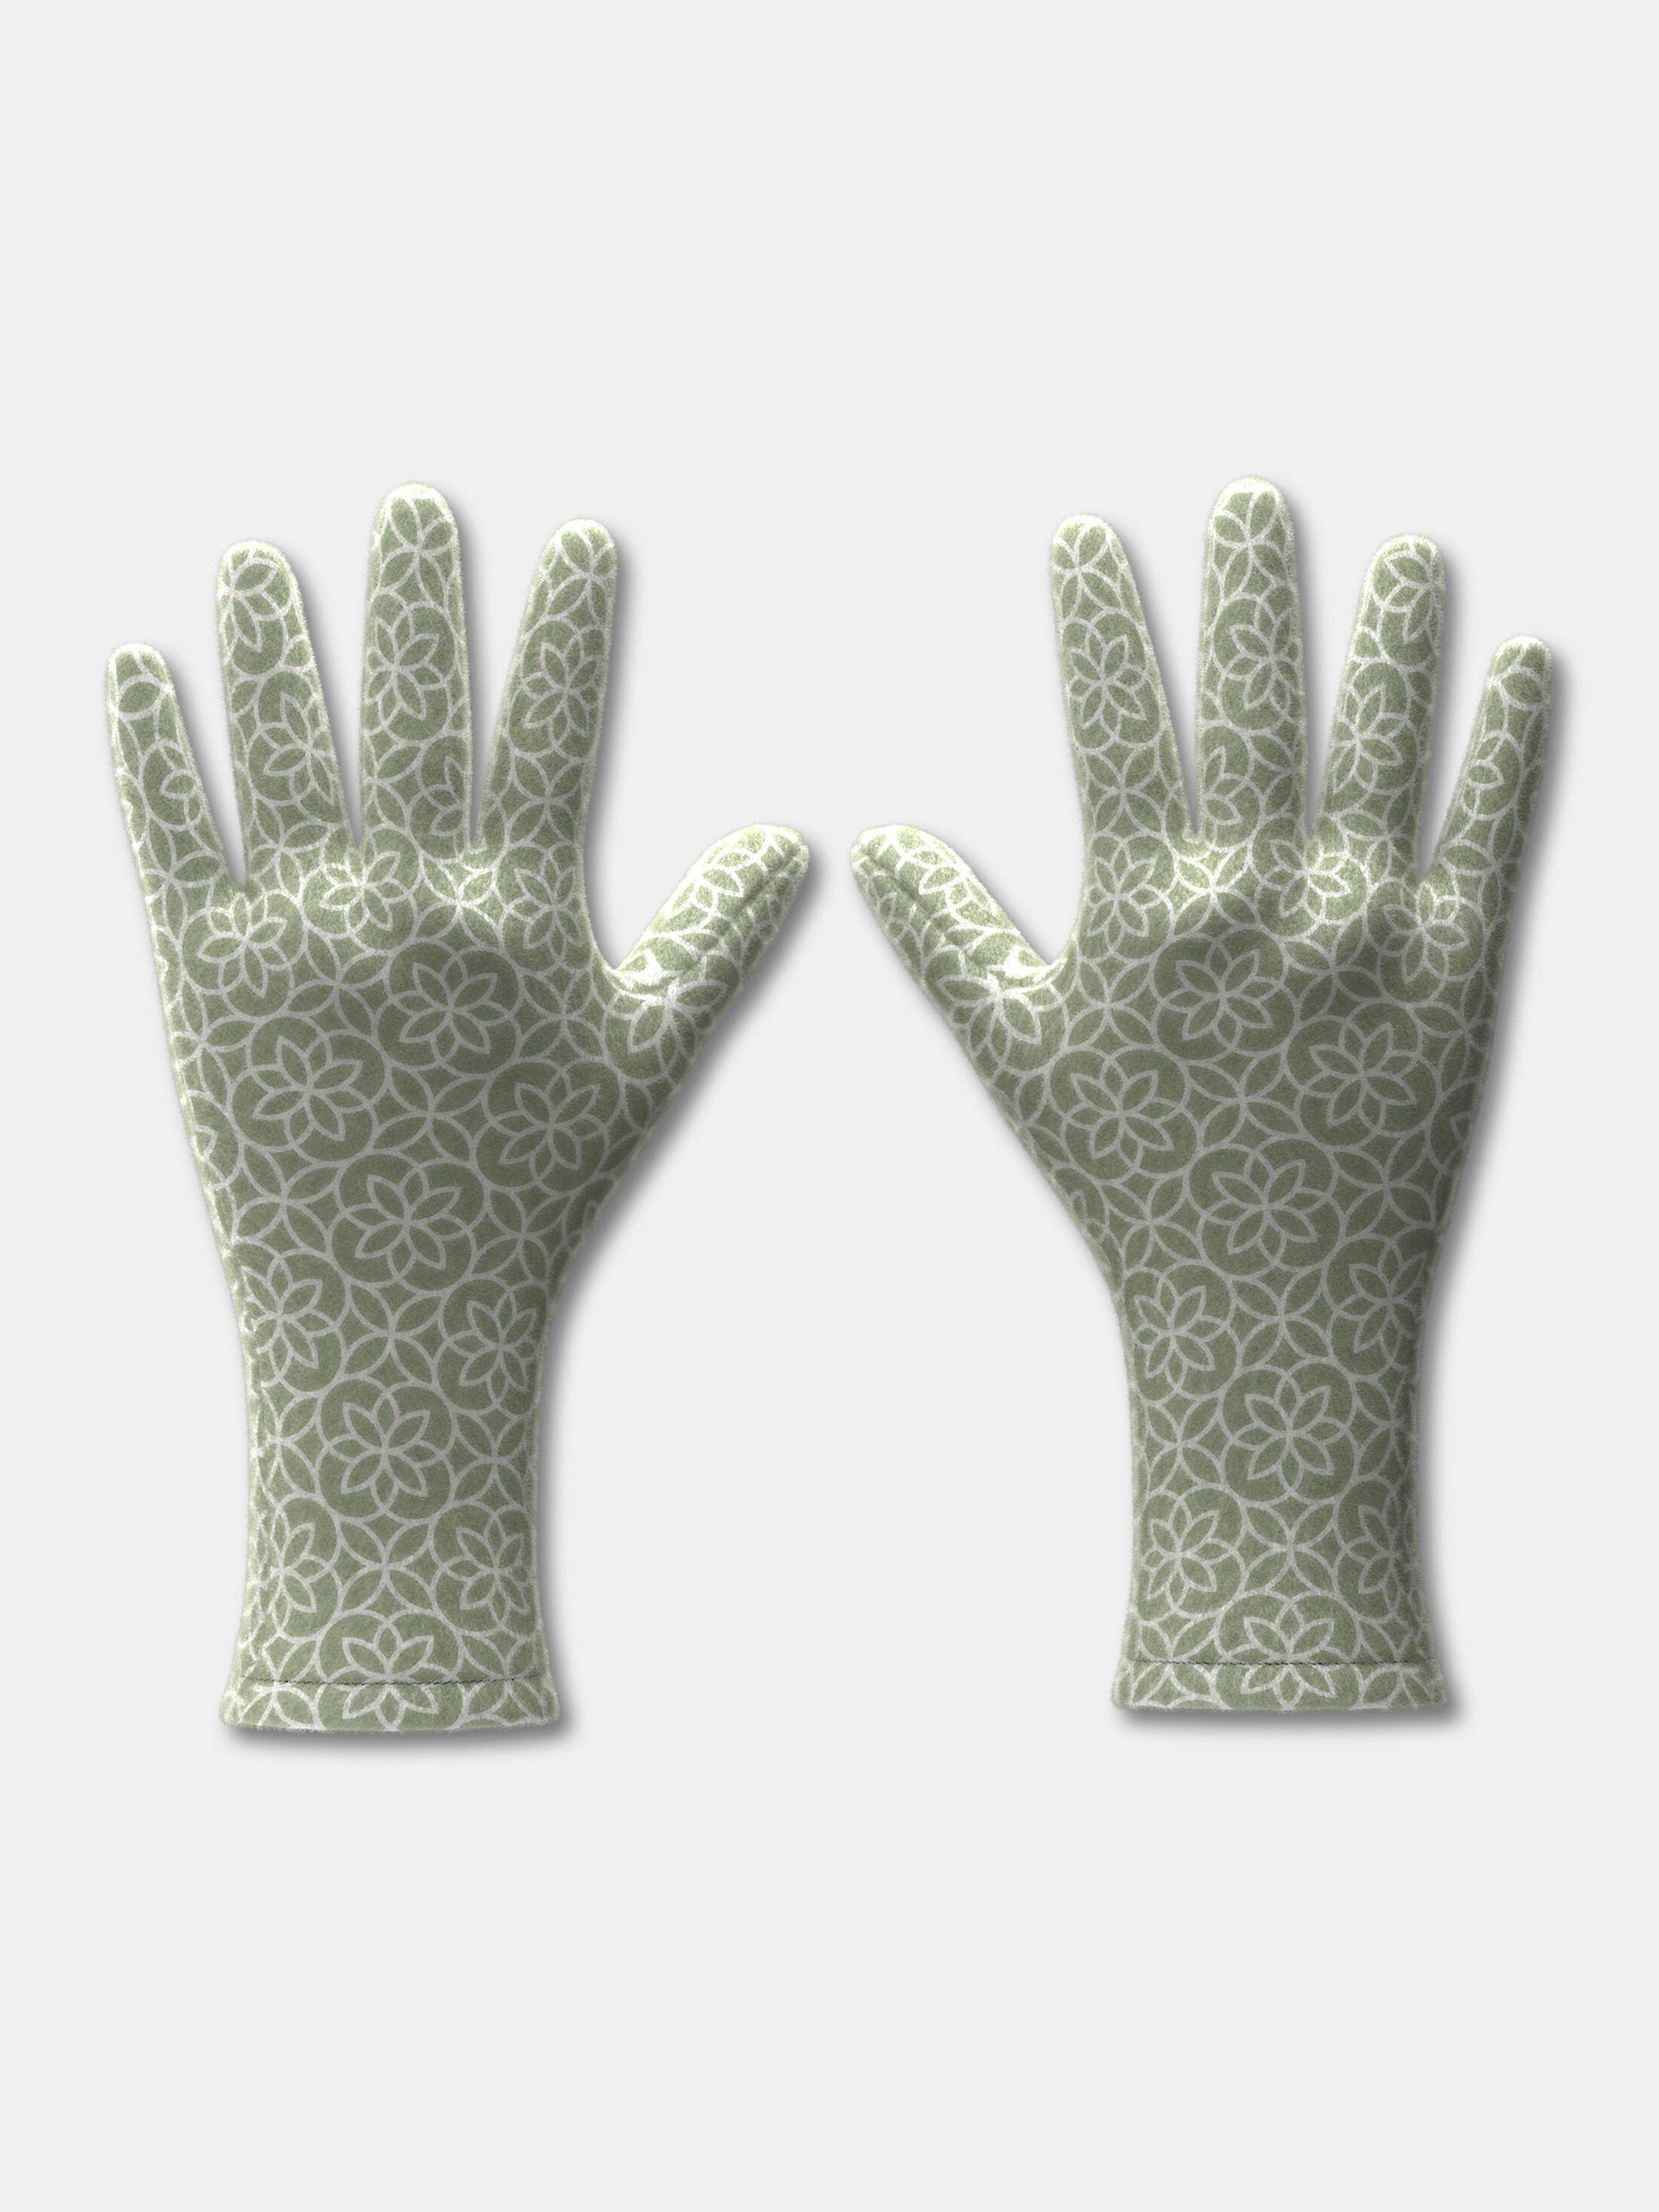 Print on demand su guanti invernali